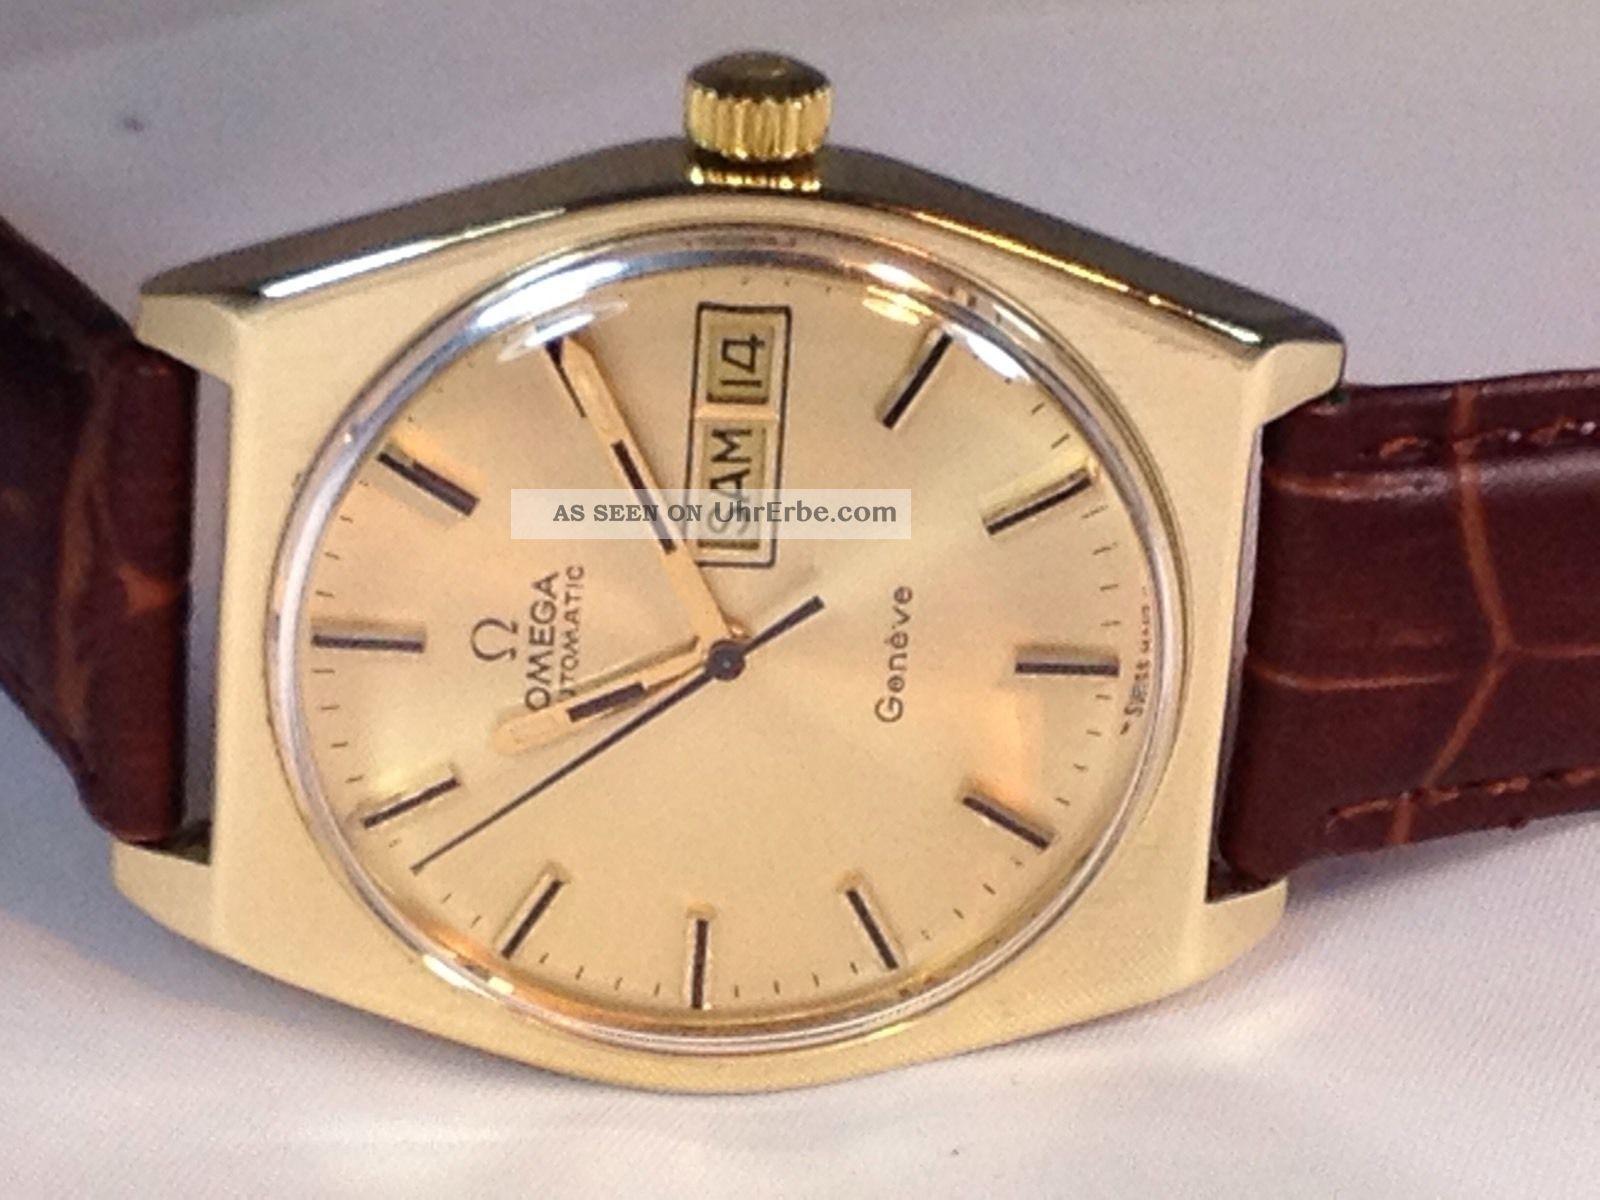 Automatik Herren Omega Armband Geneve Uhr Swiss Uhrwerk Made 54RjAL